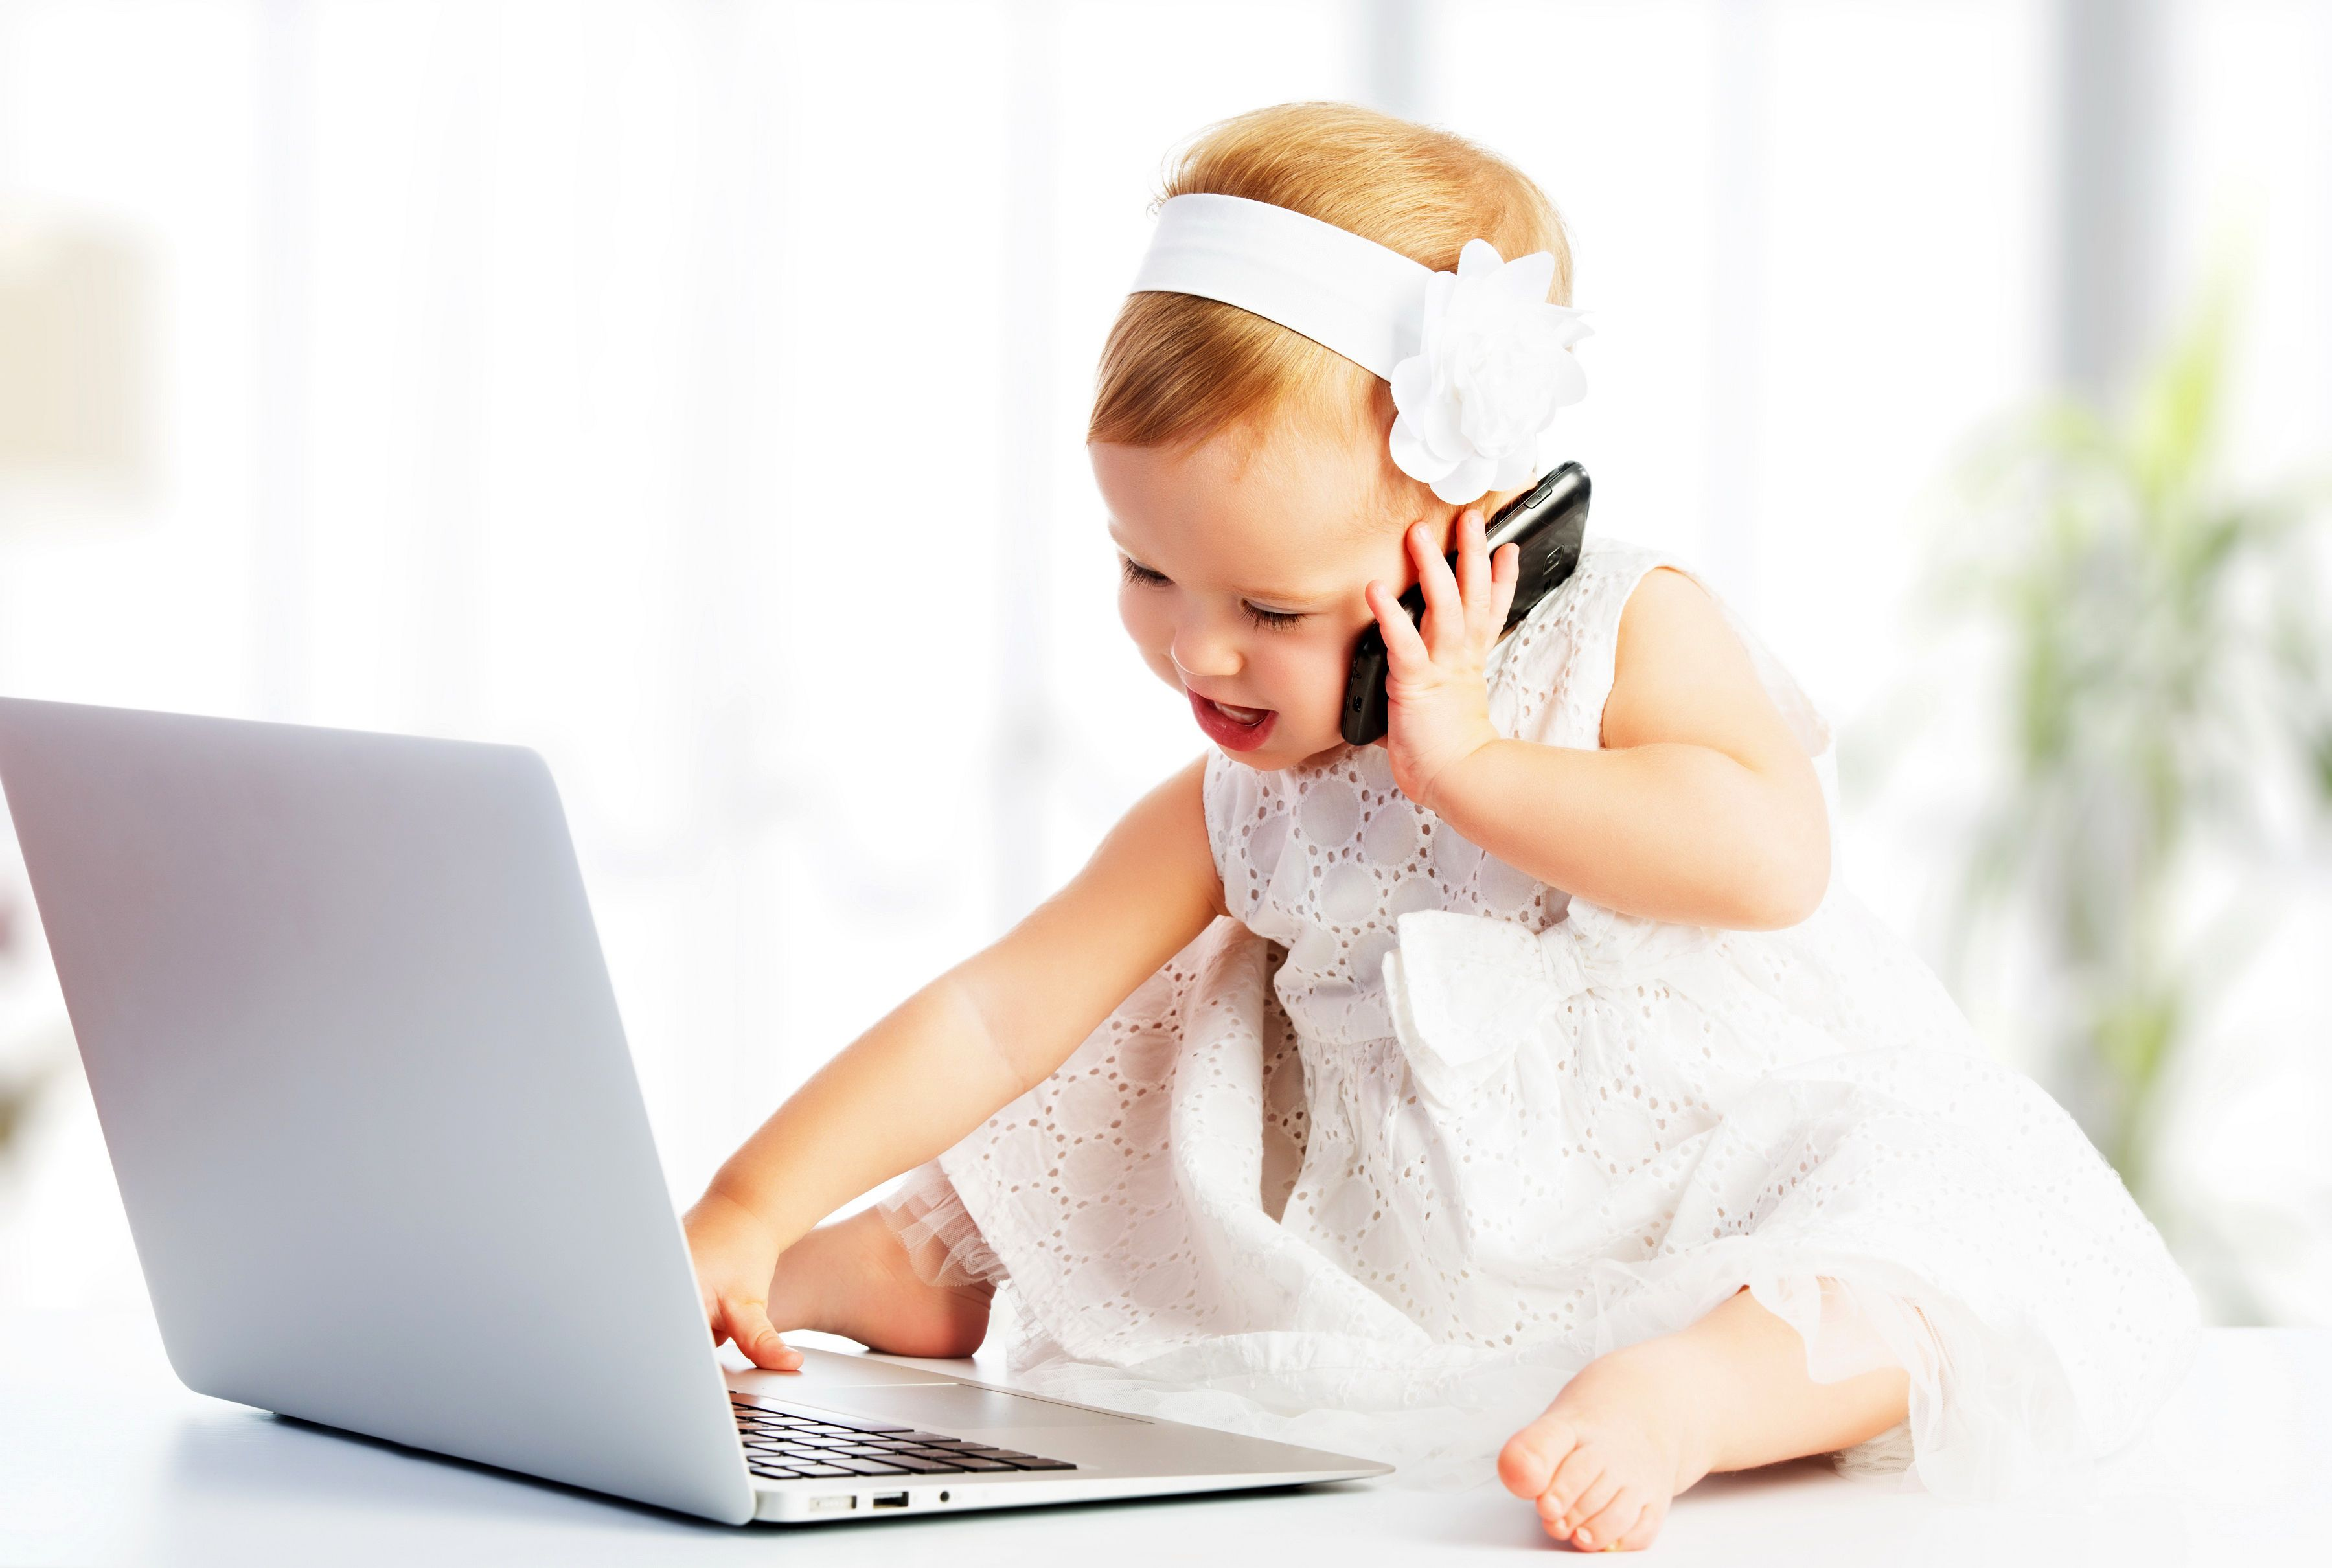 vizle Cute Baby Wallpaper HD Wallpapers Pinterest